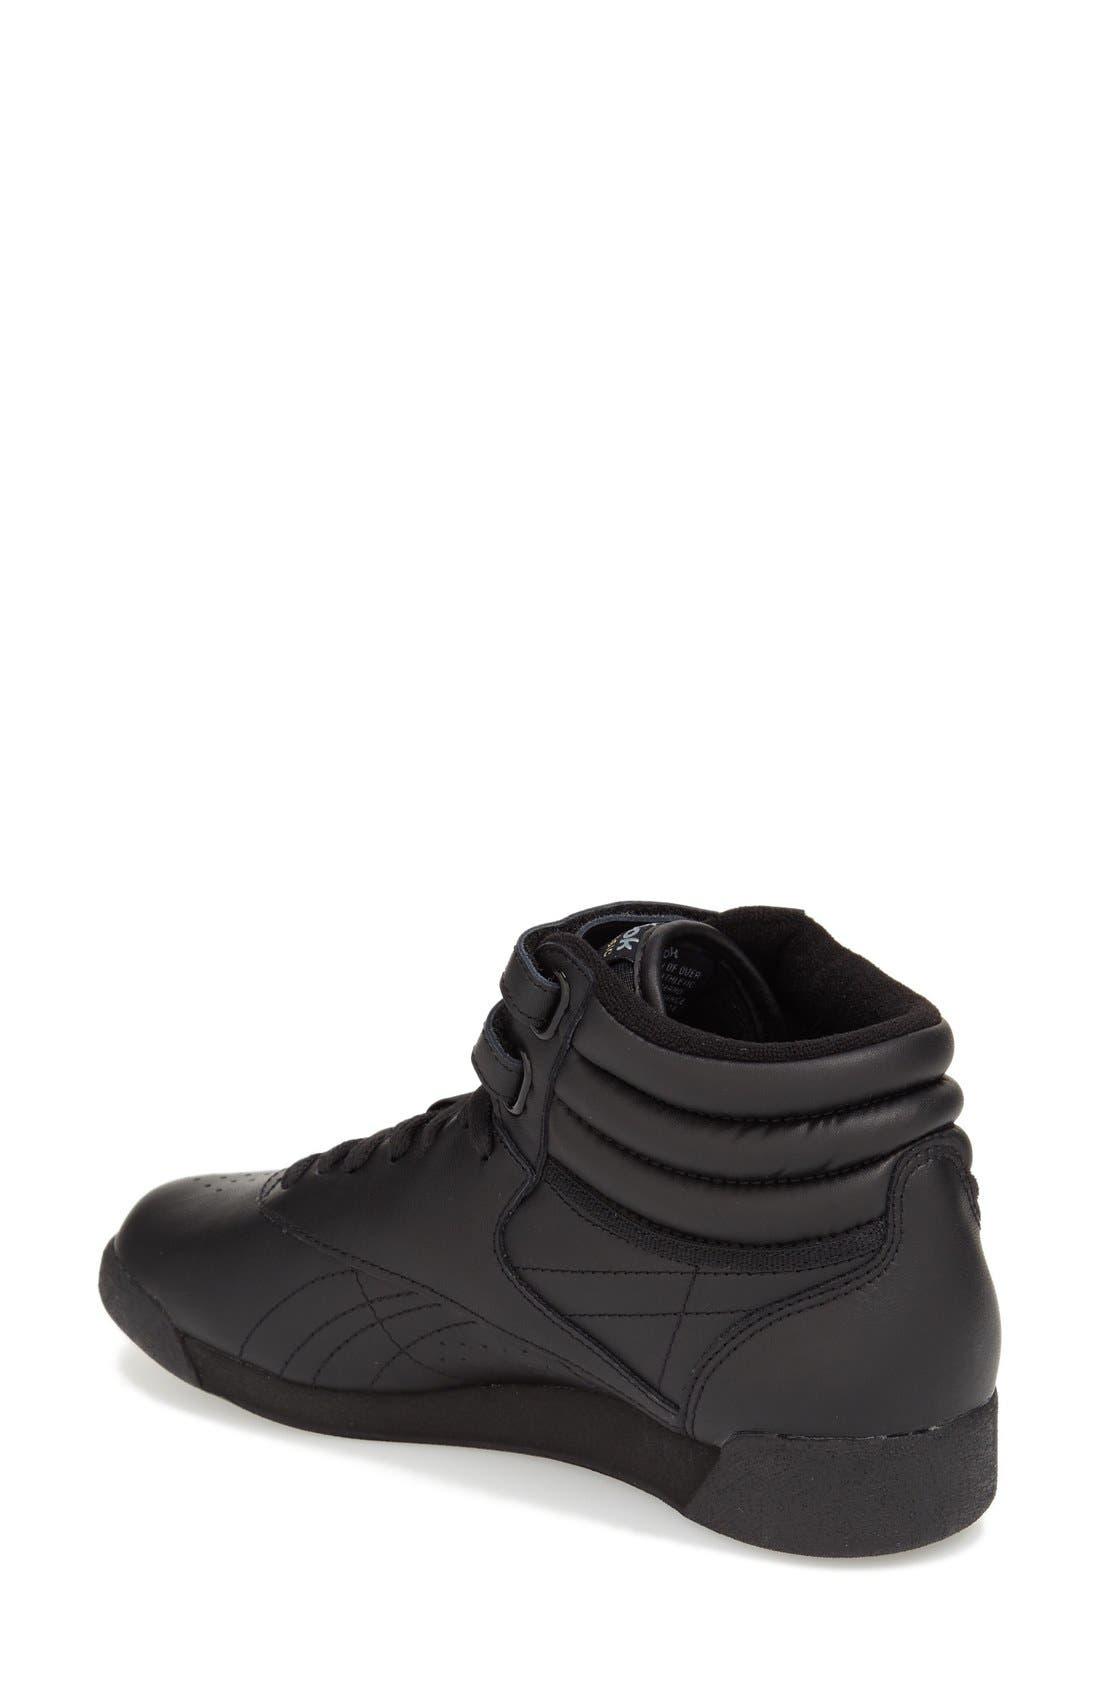 'Freestyle Hi' Sneaker,                             Alternate thumbnail 2, color,                             Black